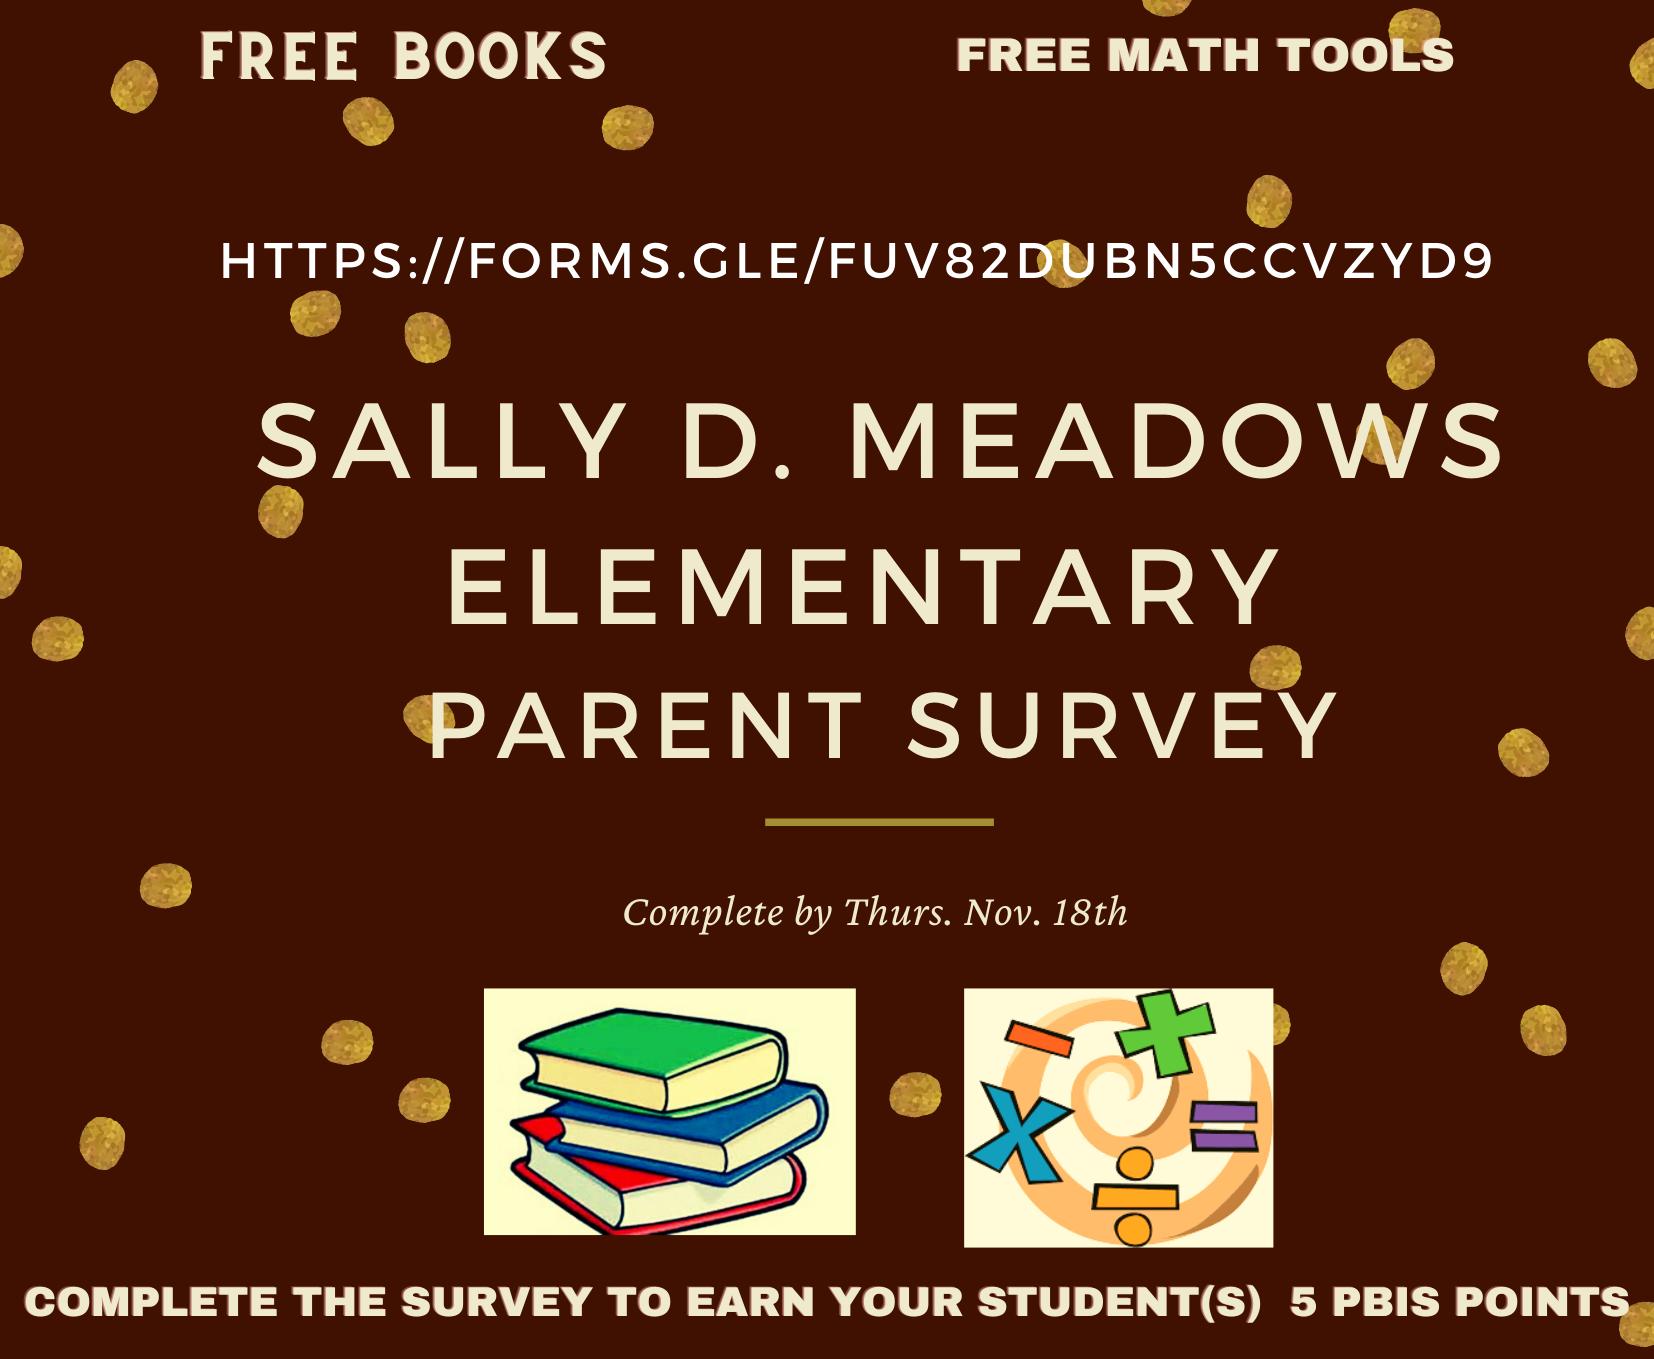 Sally D. Meadows Elementary Parent Survey